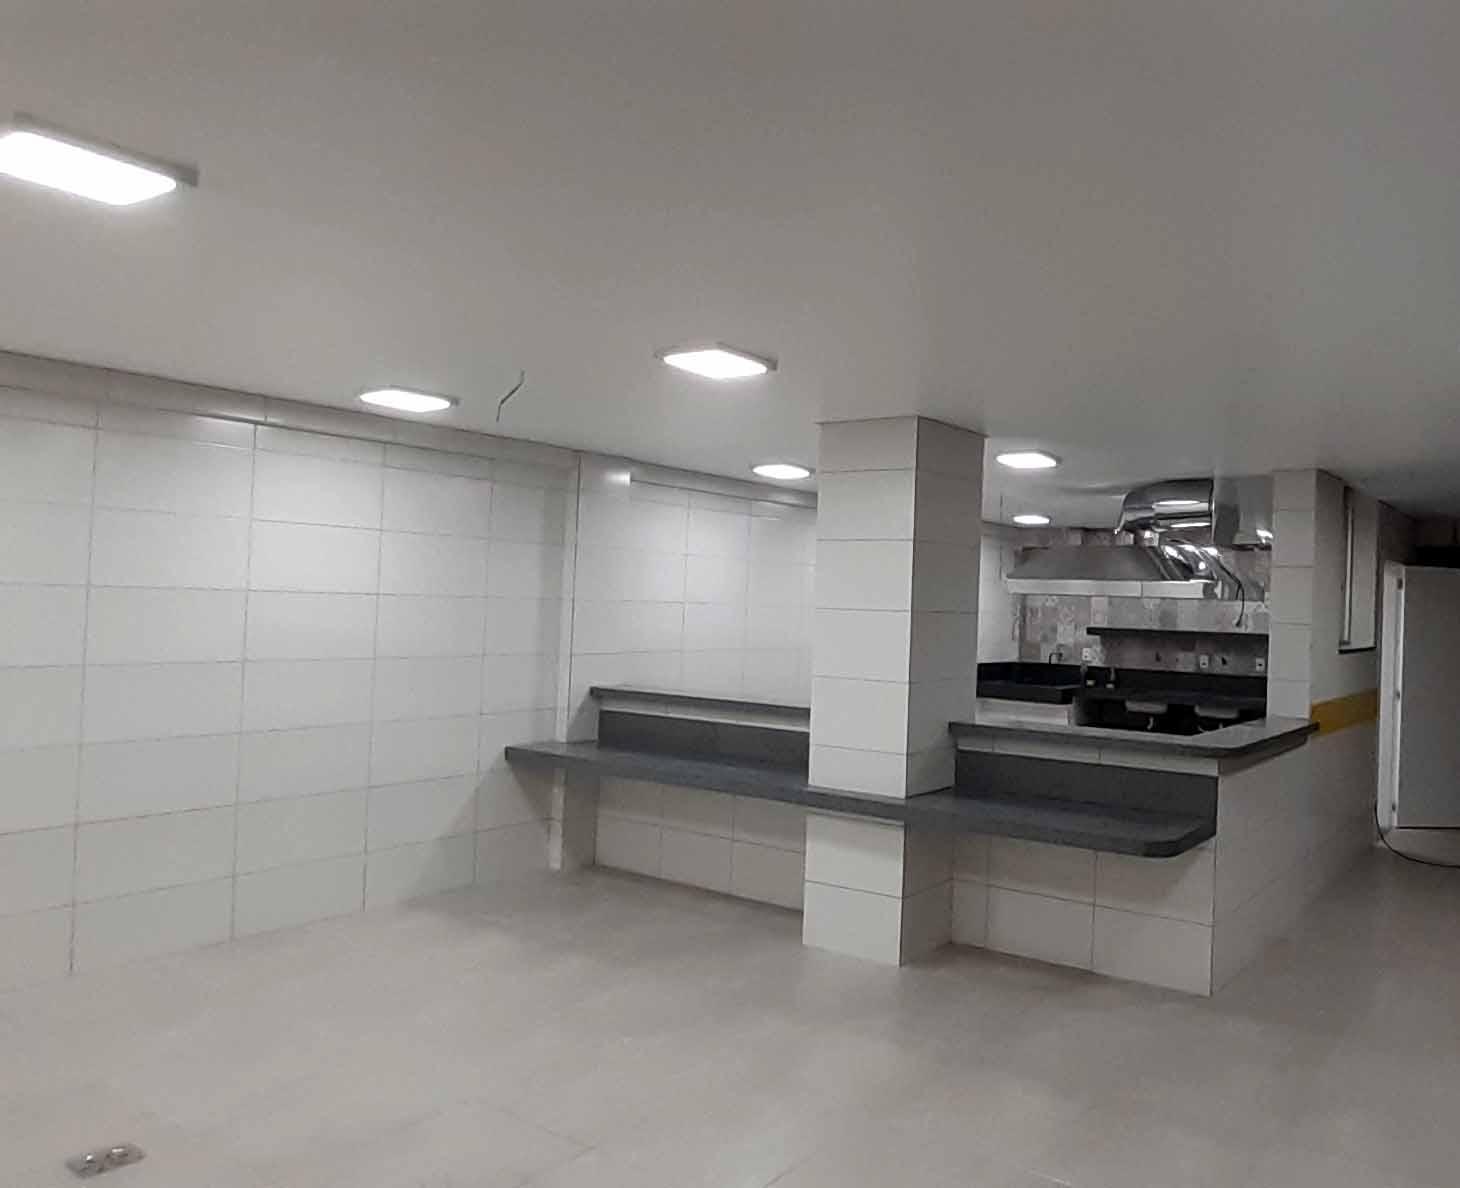 Cozinha ASCL iluminada